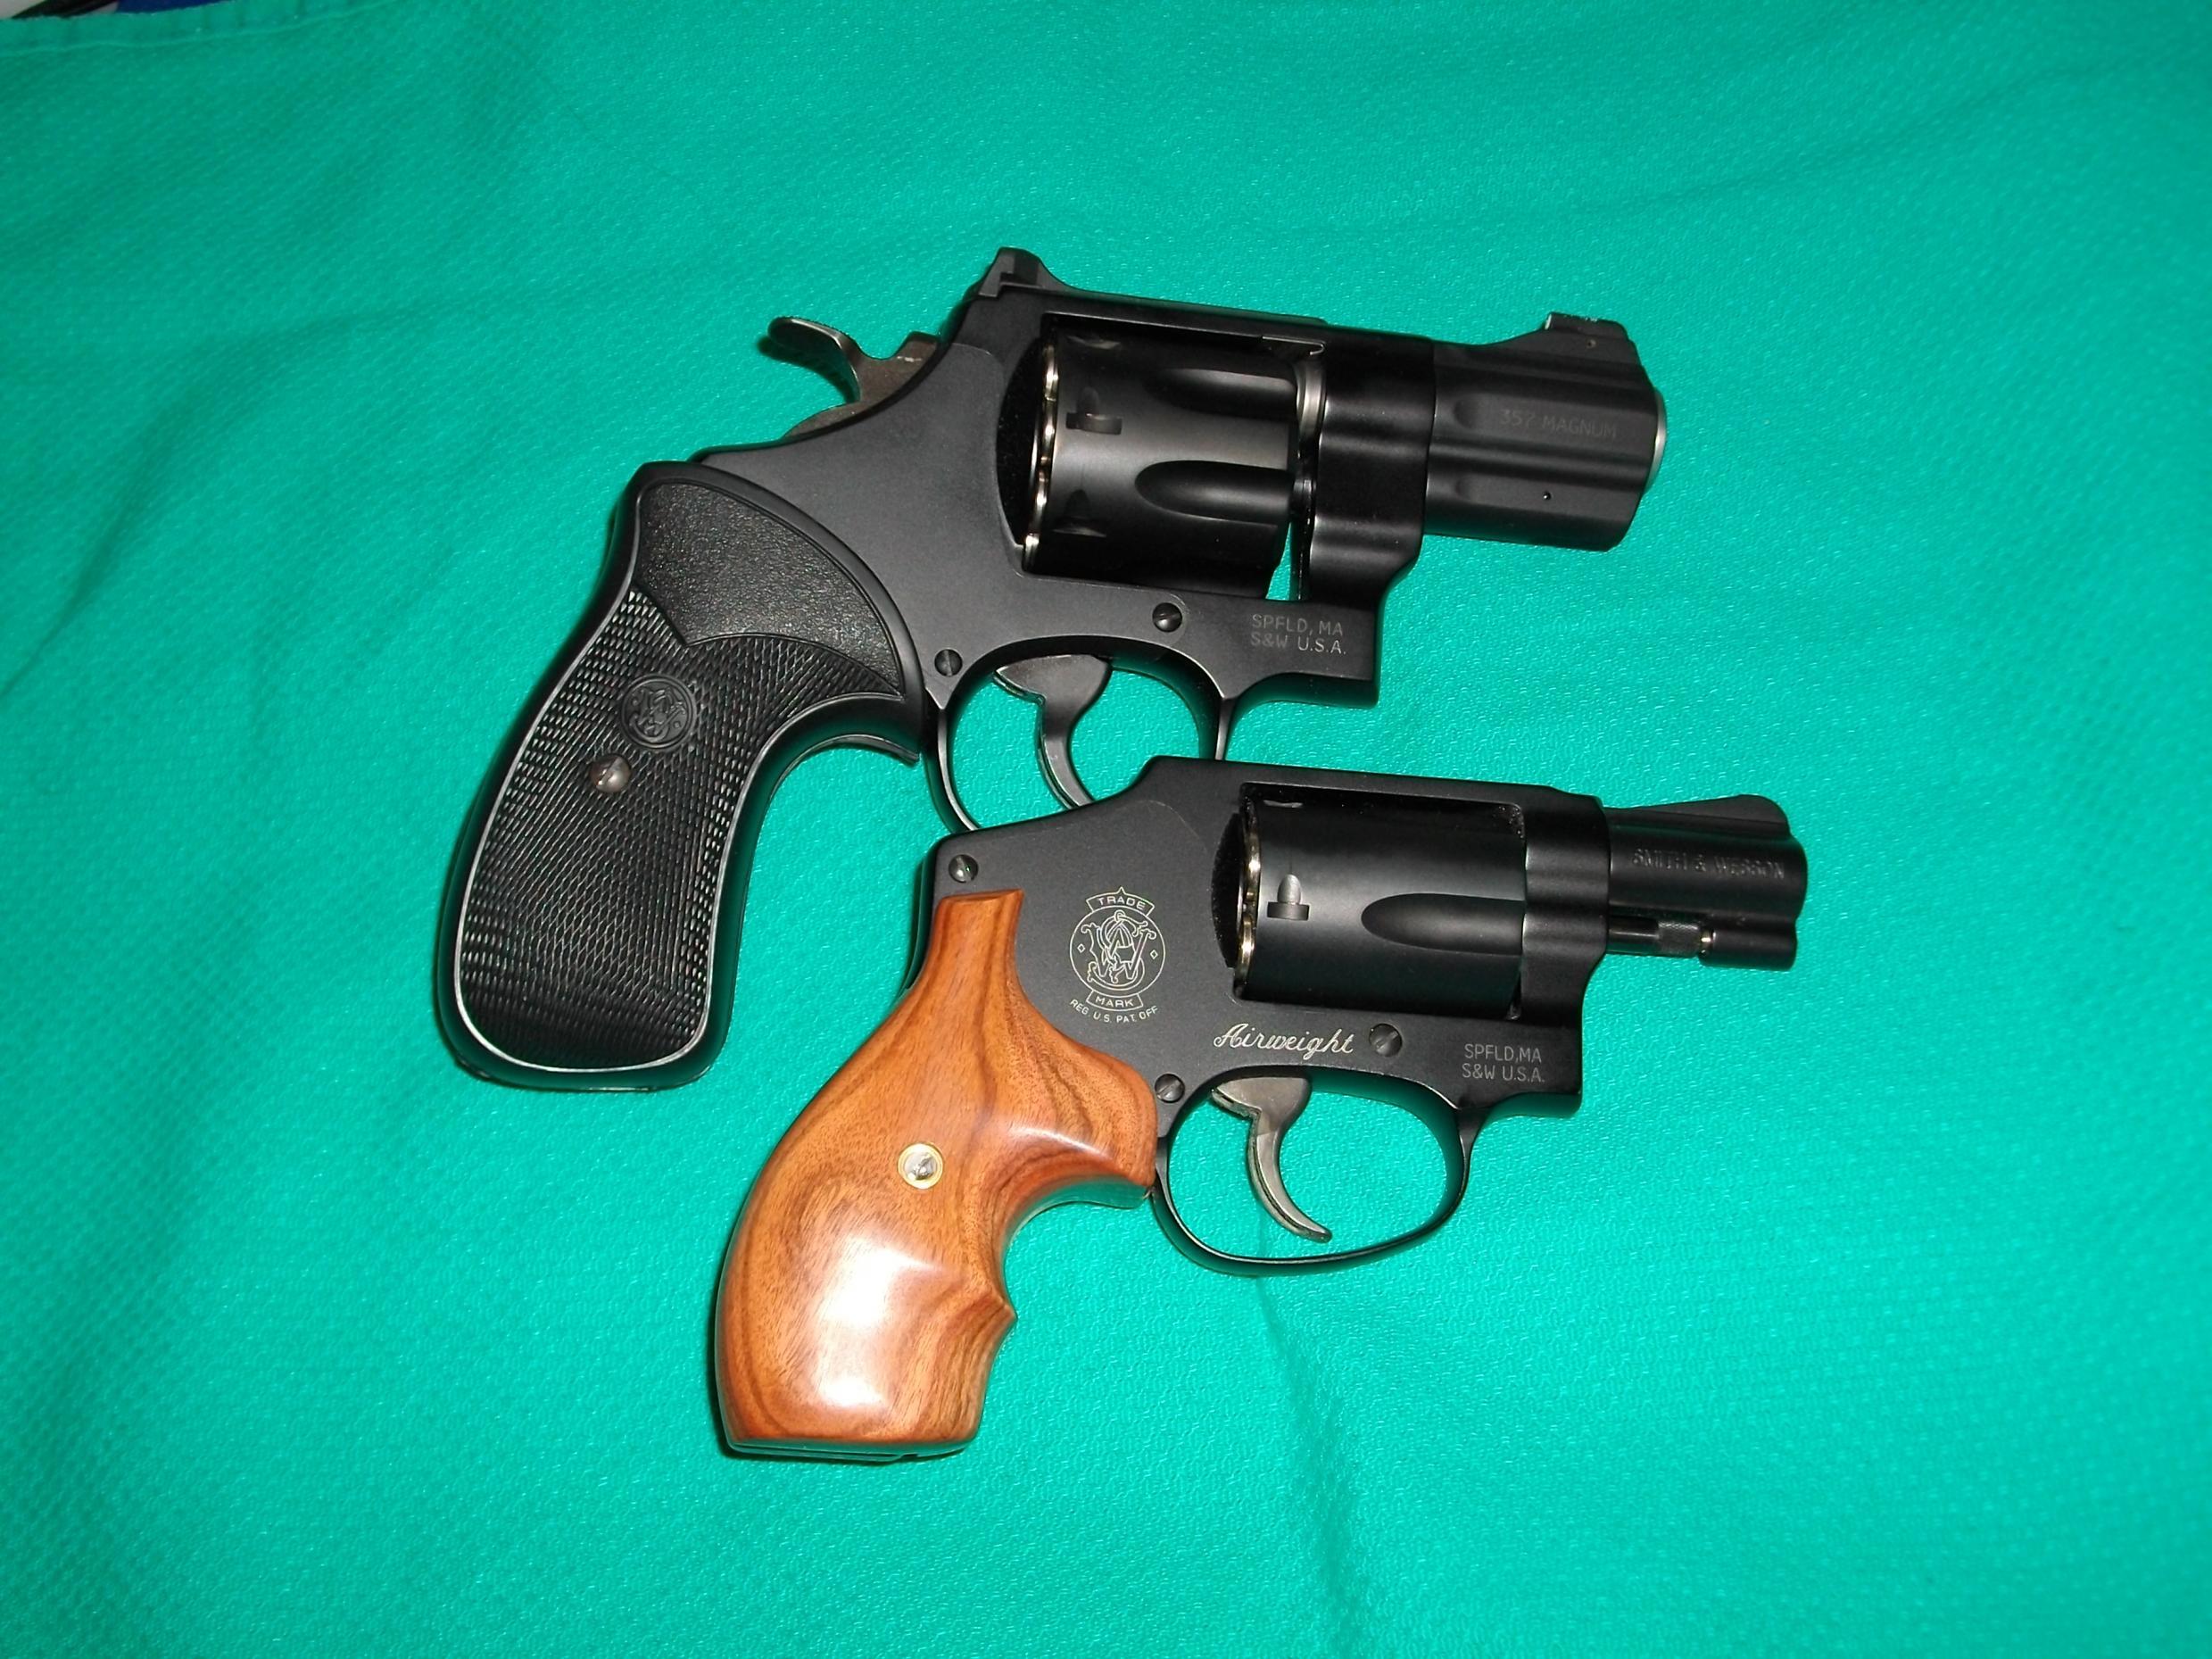 New Smith&Wesson-sany0080.jpg